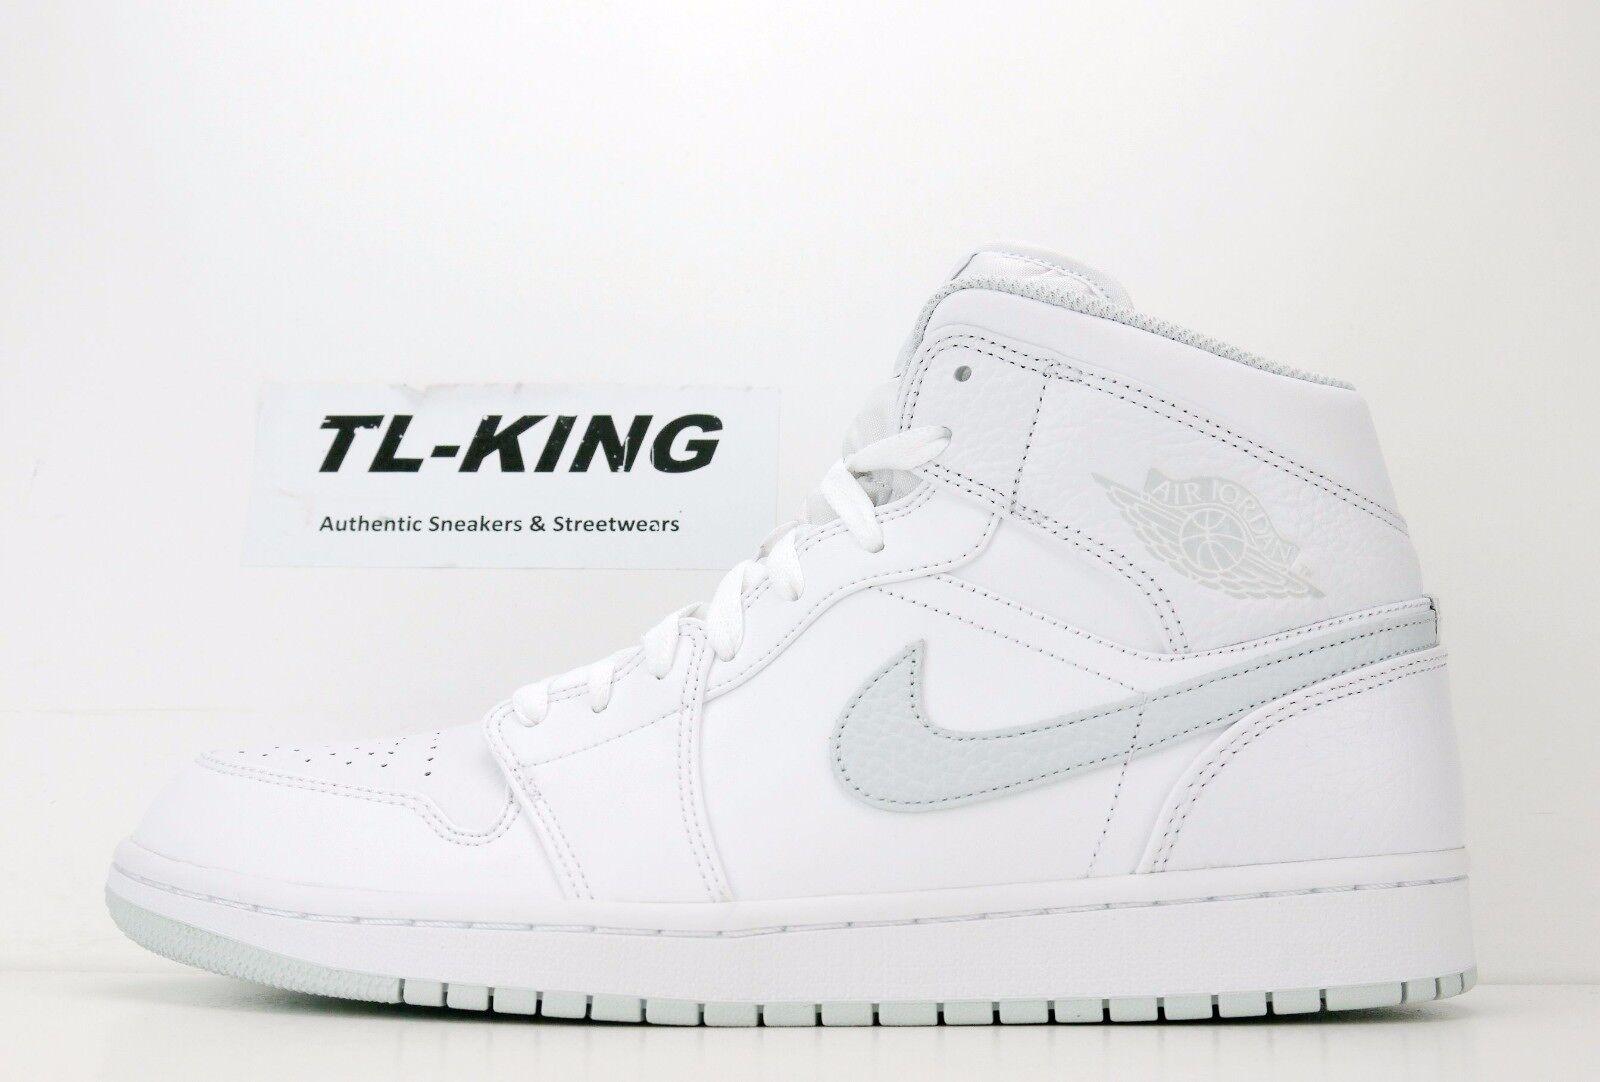 Nike Air Jordan 1 One Retro Mid Msrp White Pure Platinum 554724-108 Msrp Mid 110 Eb 824d42